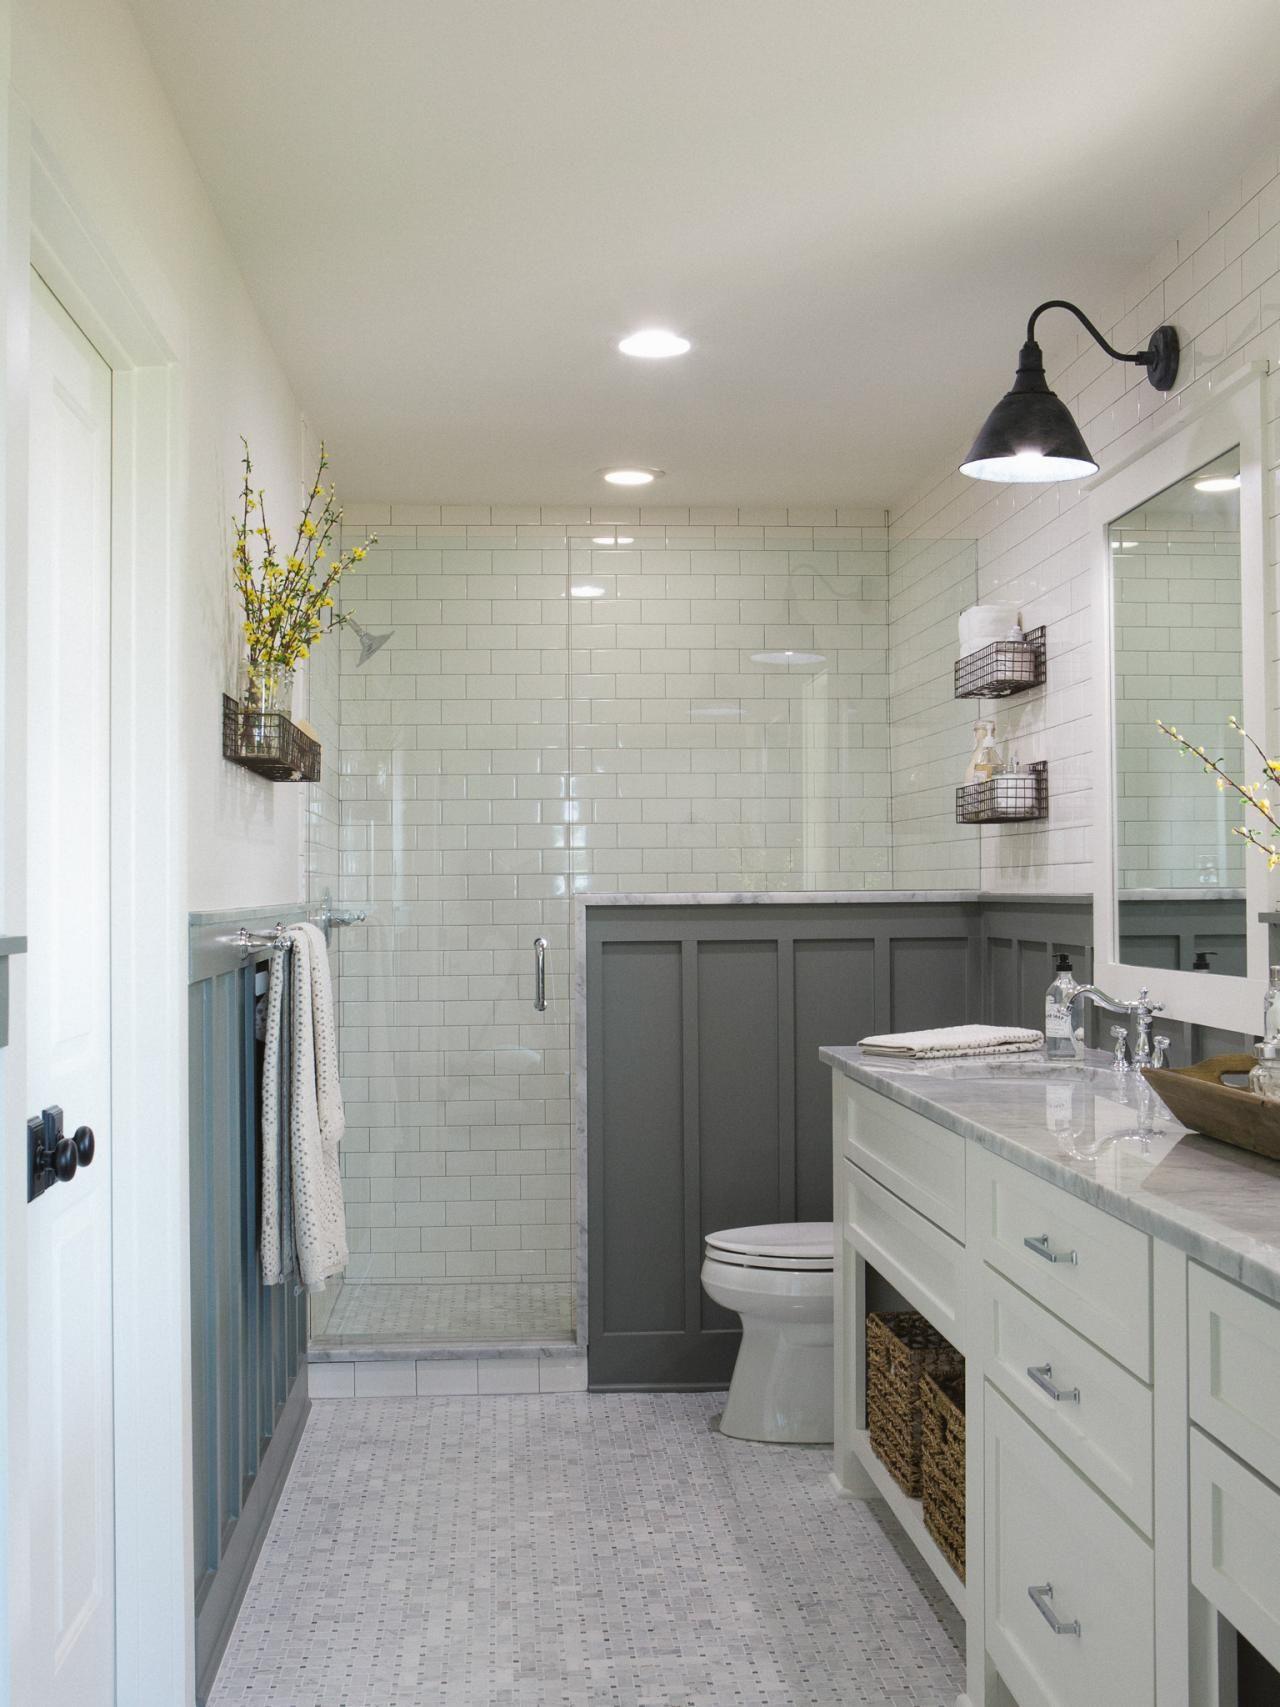 Joanna Gaines Bathroom Designs Bathroom Mirrors For Sale